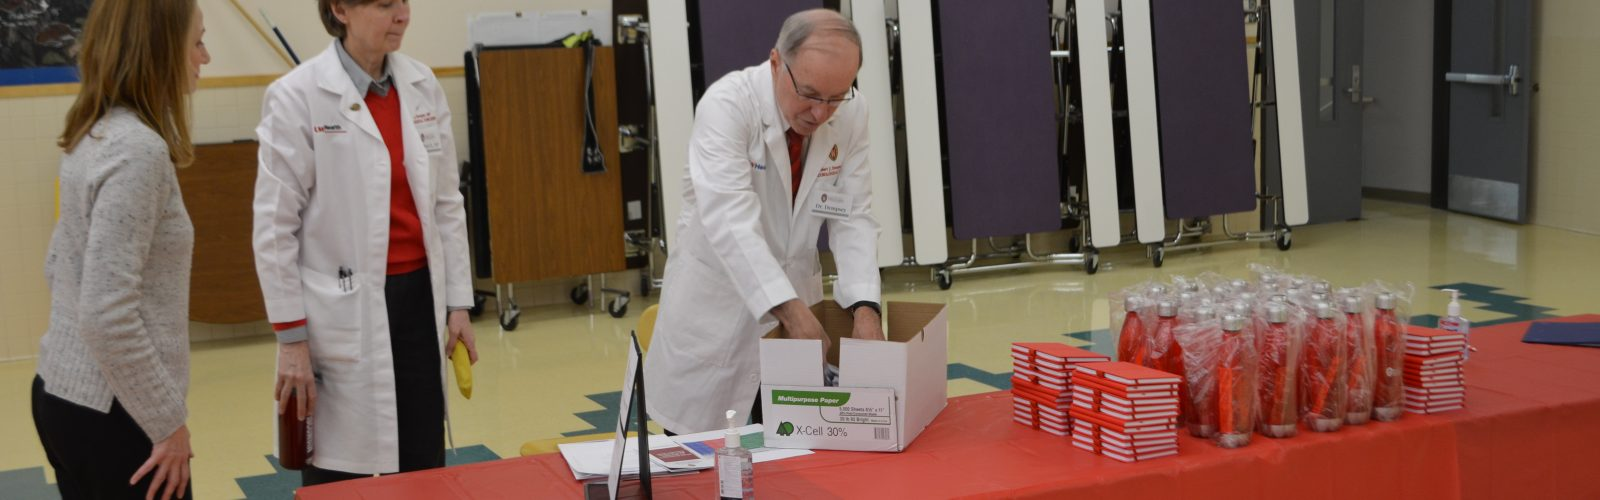 Researchers setting stuff up before a health fair